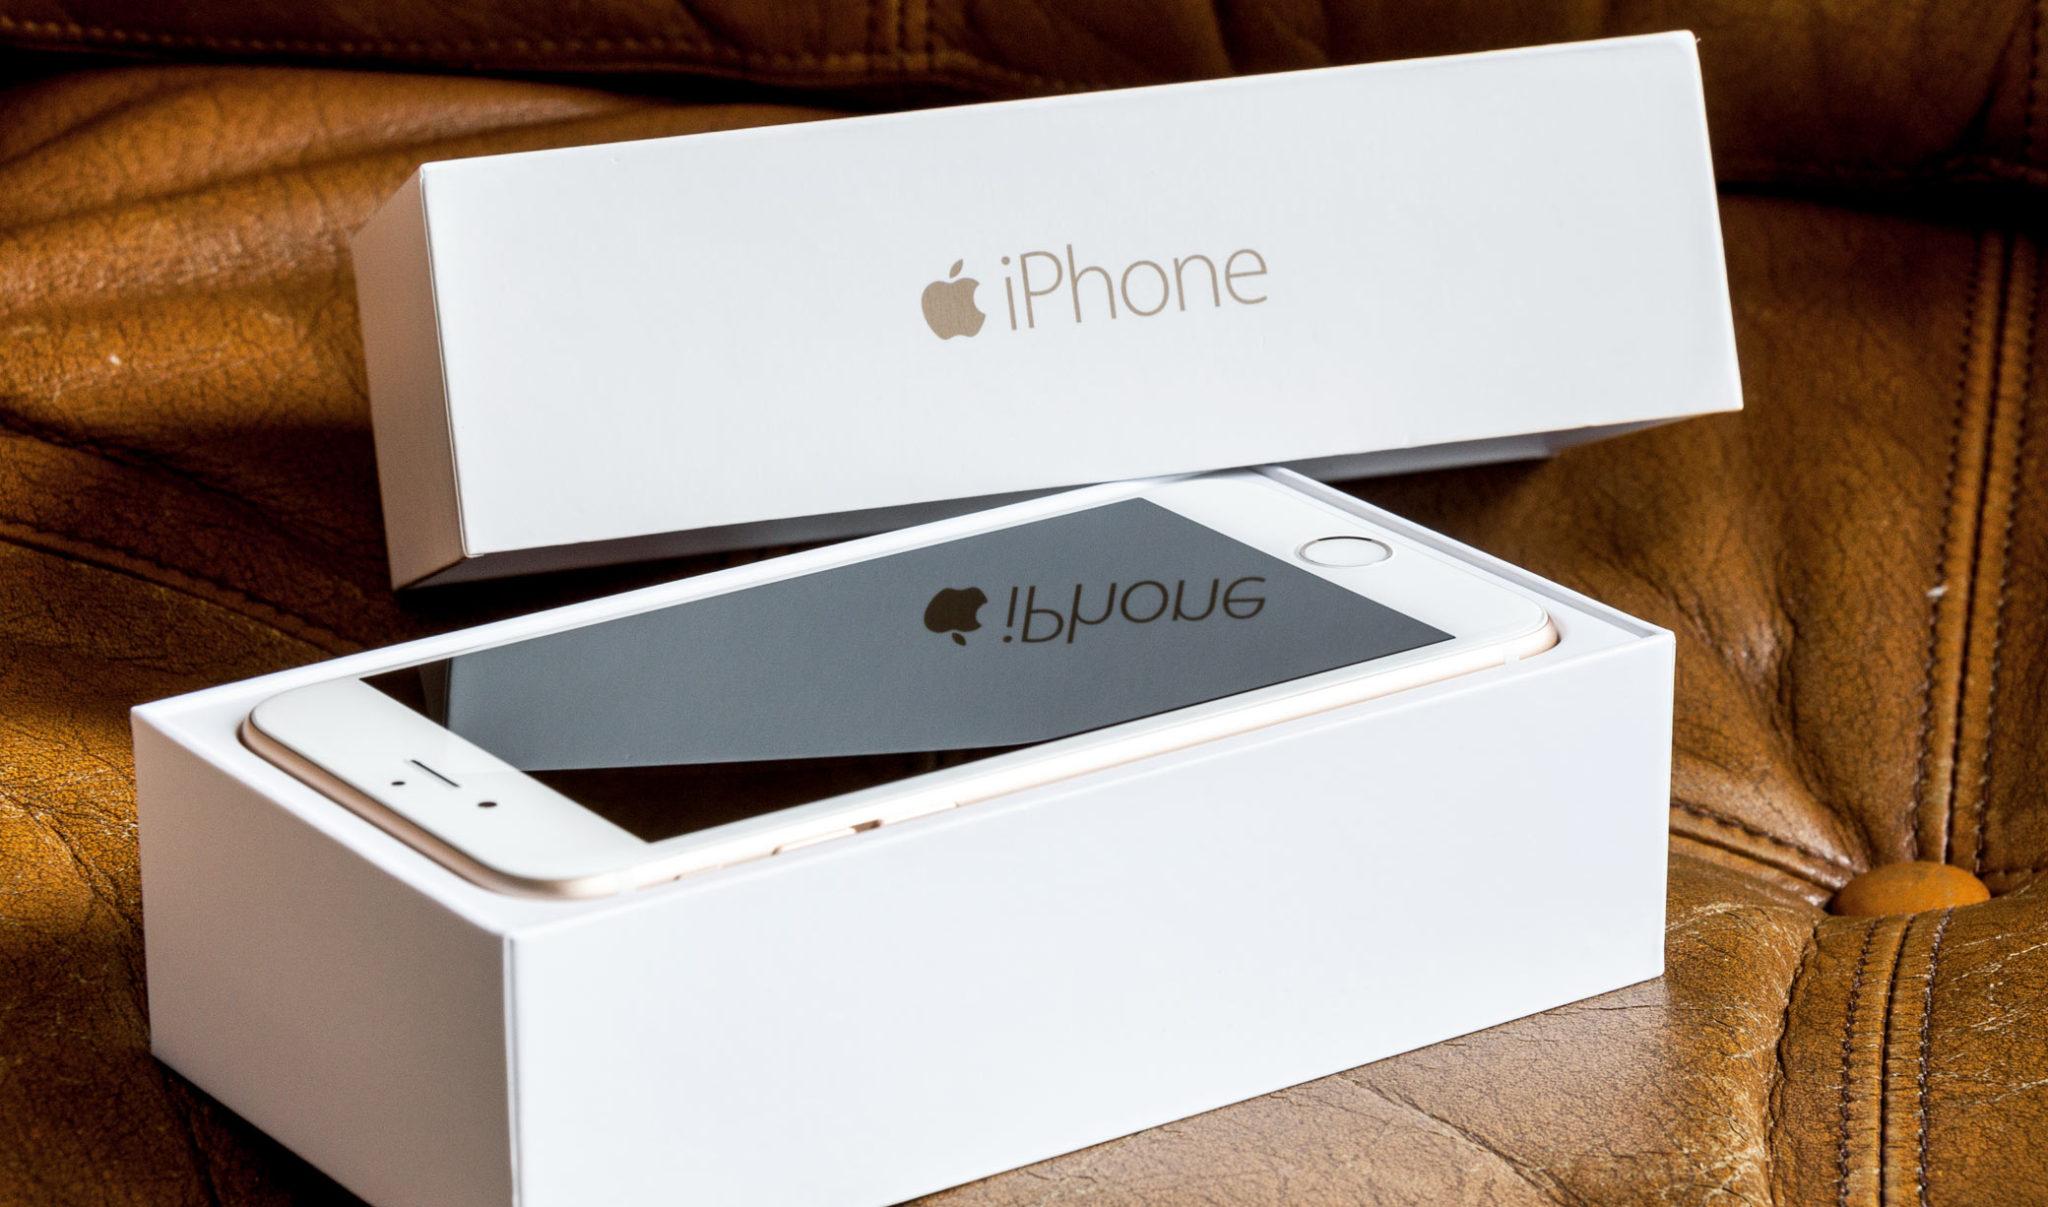 Pašerák schoval kilo kokainu do krabice od iPhonu. Dostal za to trest smrti